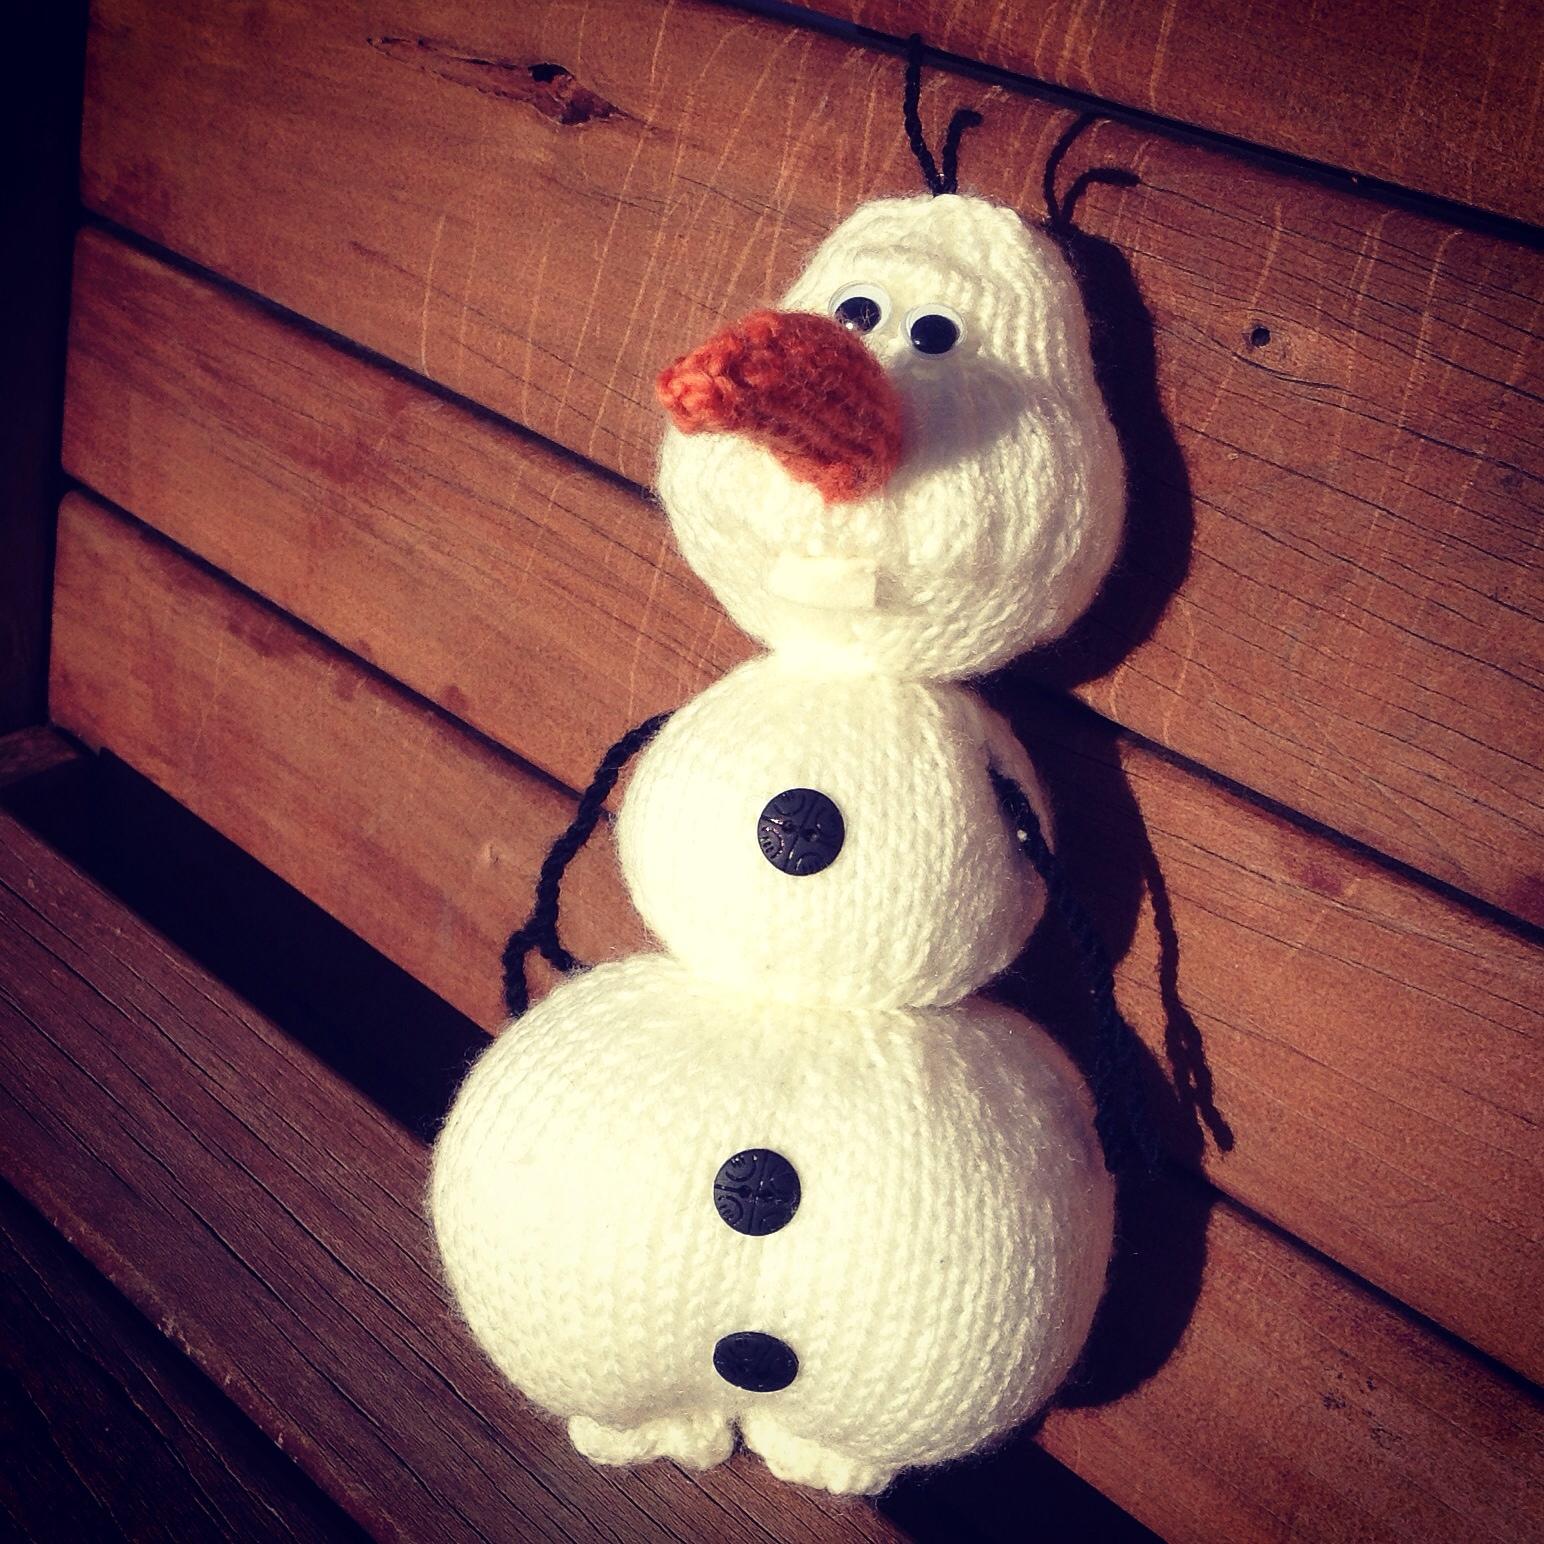 Olaf The Snowman Straight Needle Knitting Pattern The Knit Guru